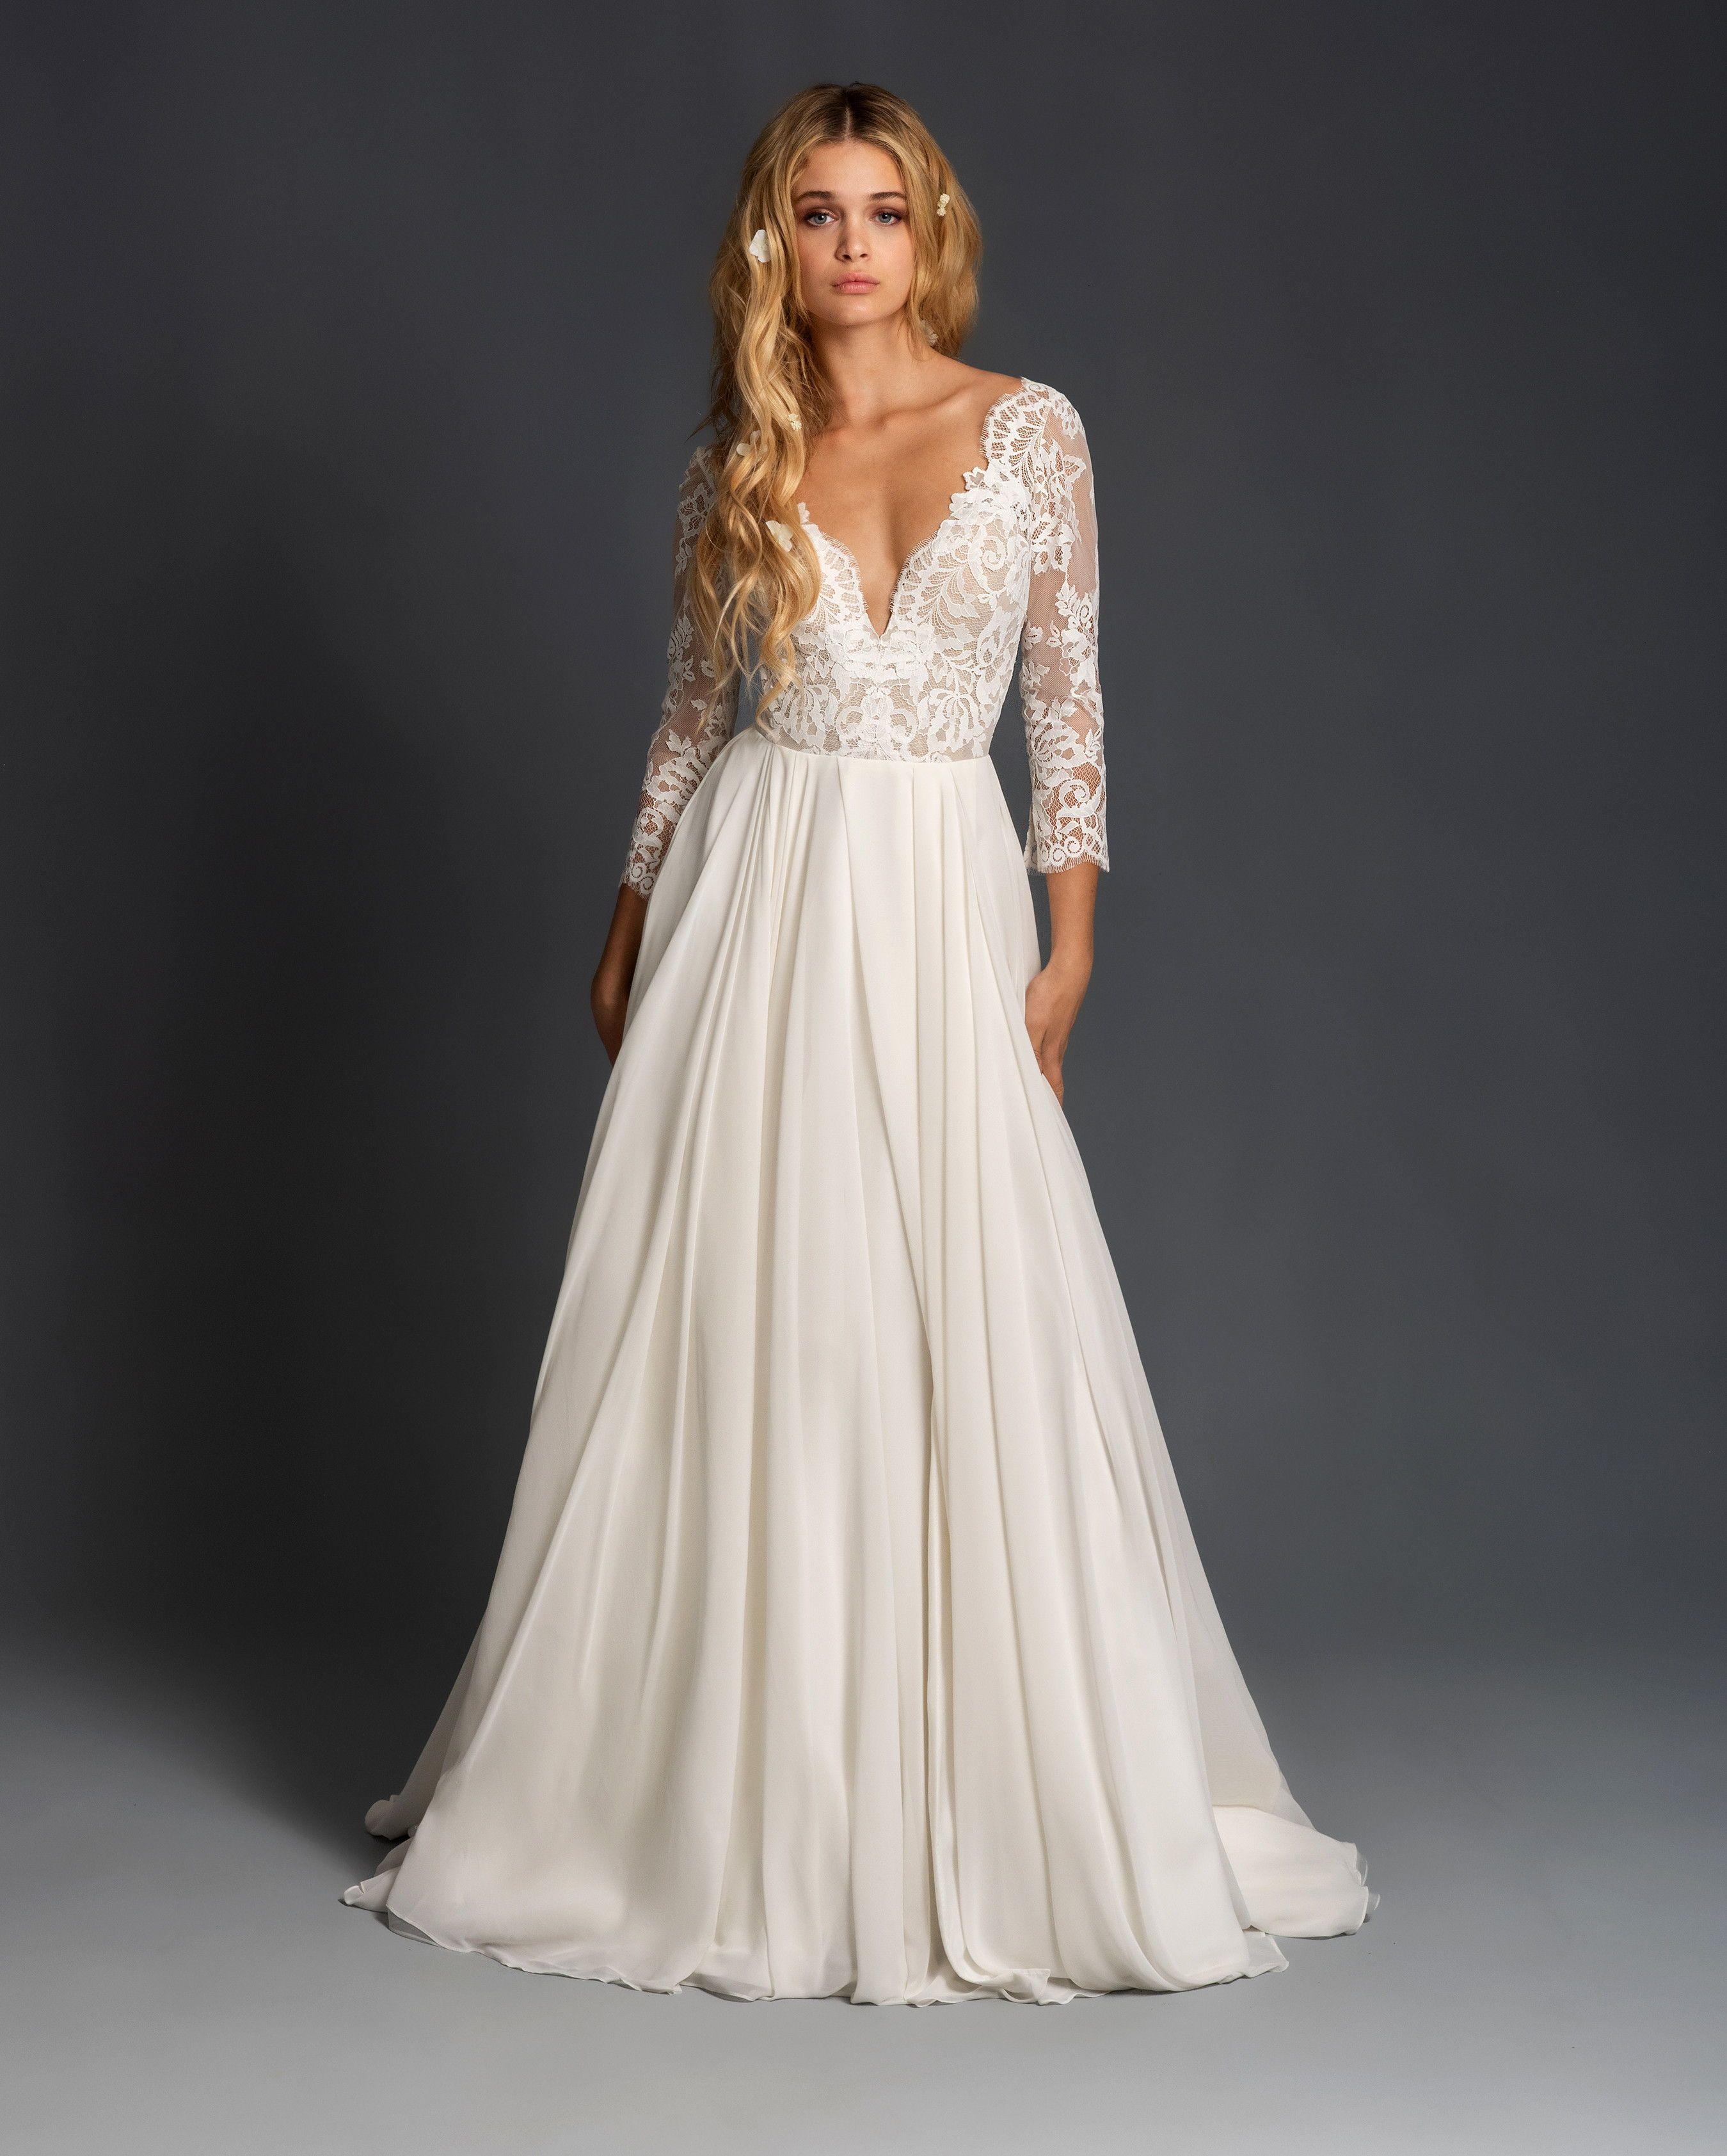 Blush By Hayley Paige Spring 2020 Wedding Dress Collection Wedding Dresses Blush Wedding Dresses Lace Wedding Dress Long Sleeve [ 3369 x 2699 Pixel ]